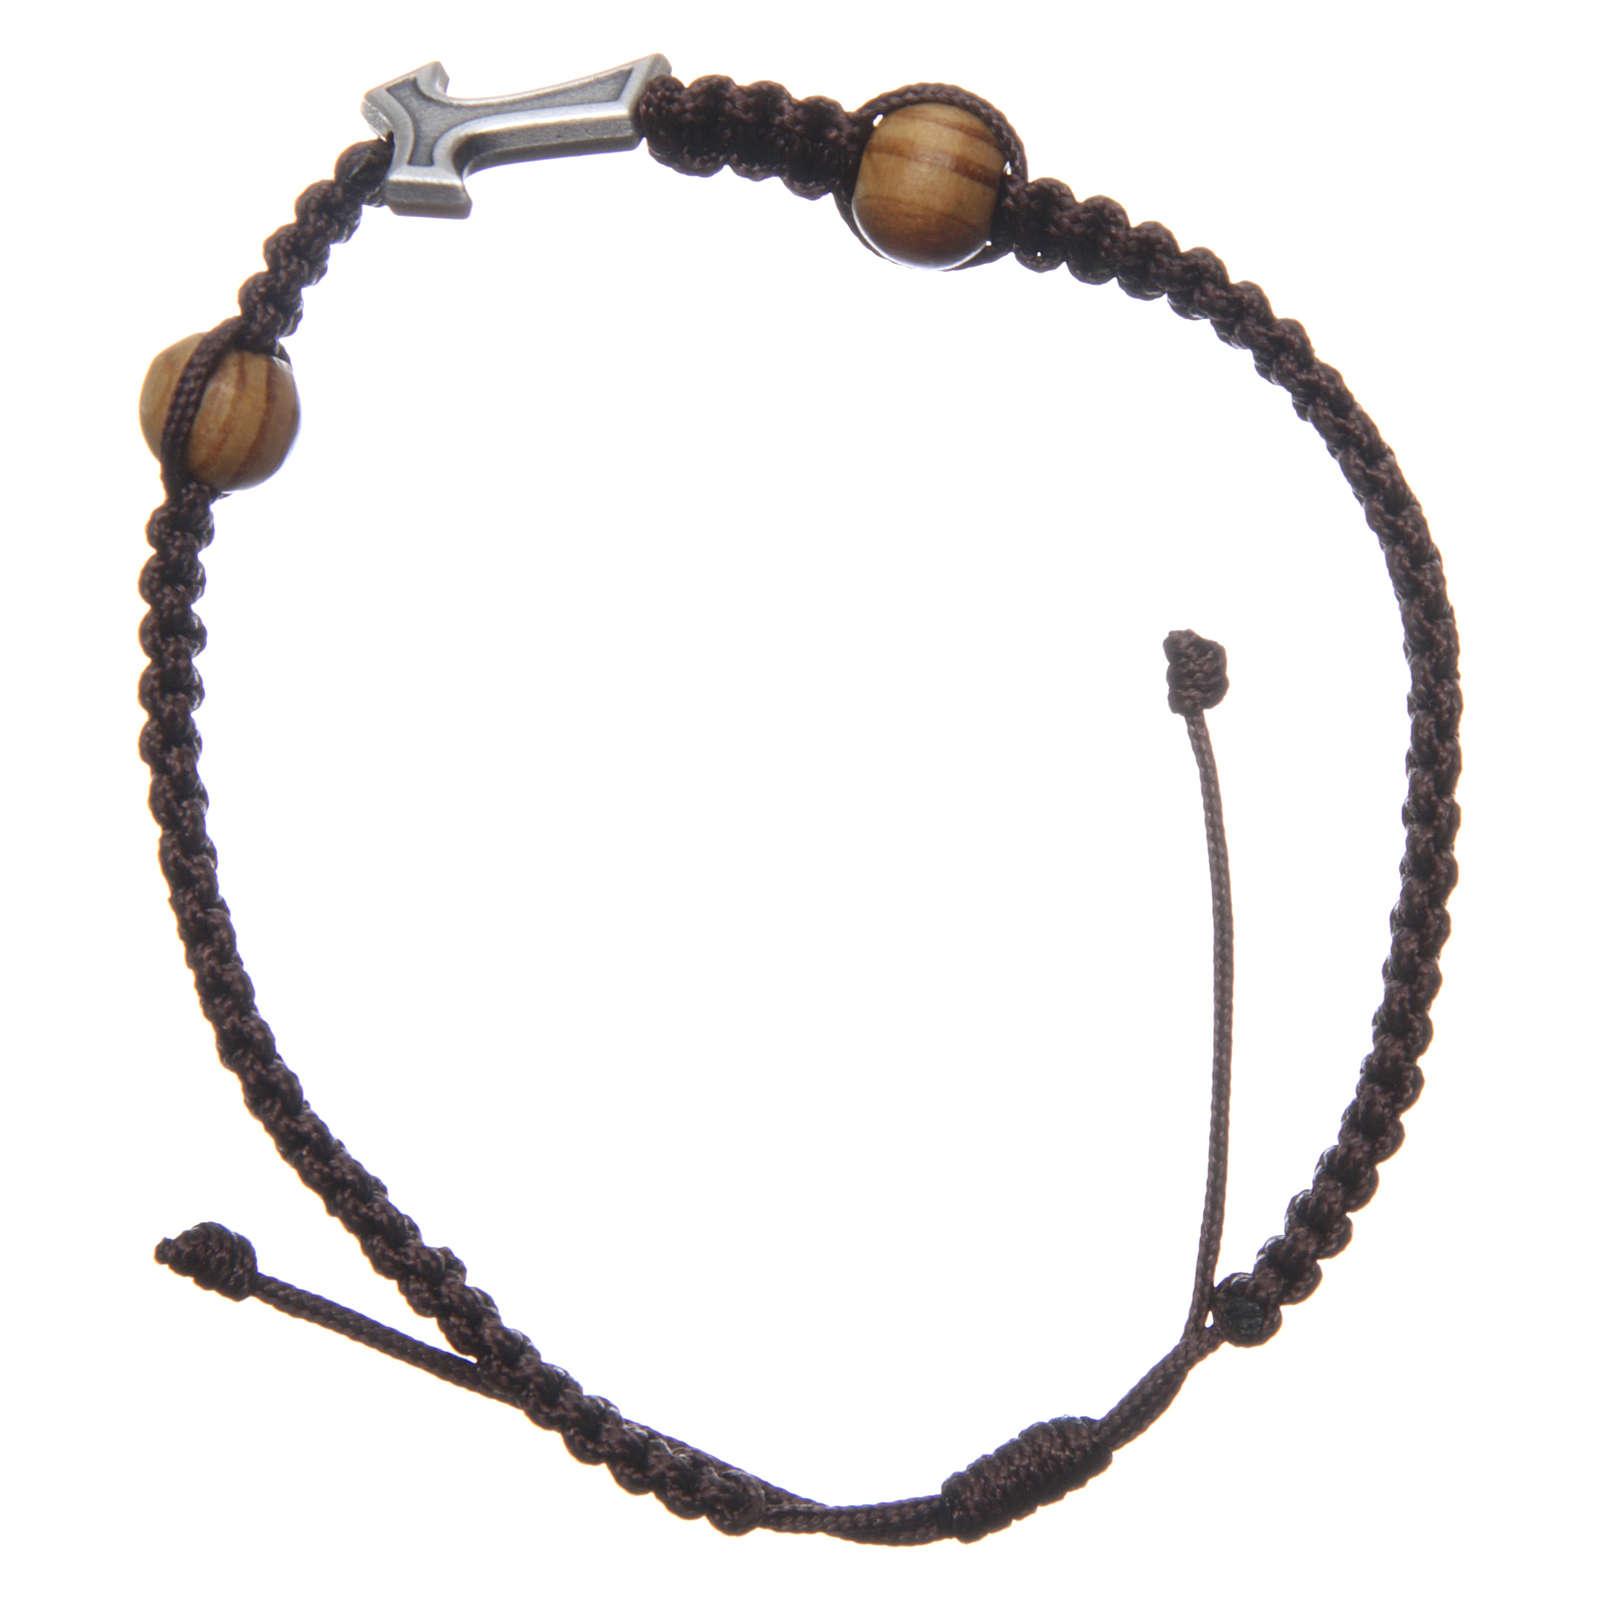 Bracciale Medjugorje corda marrone croce Tau 2 grani 4